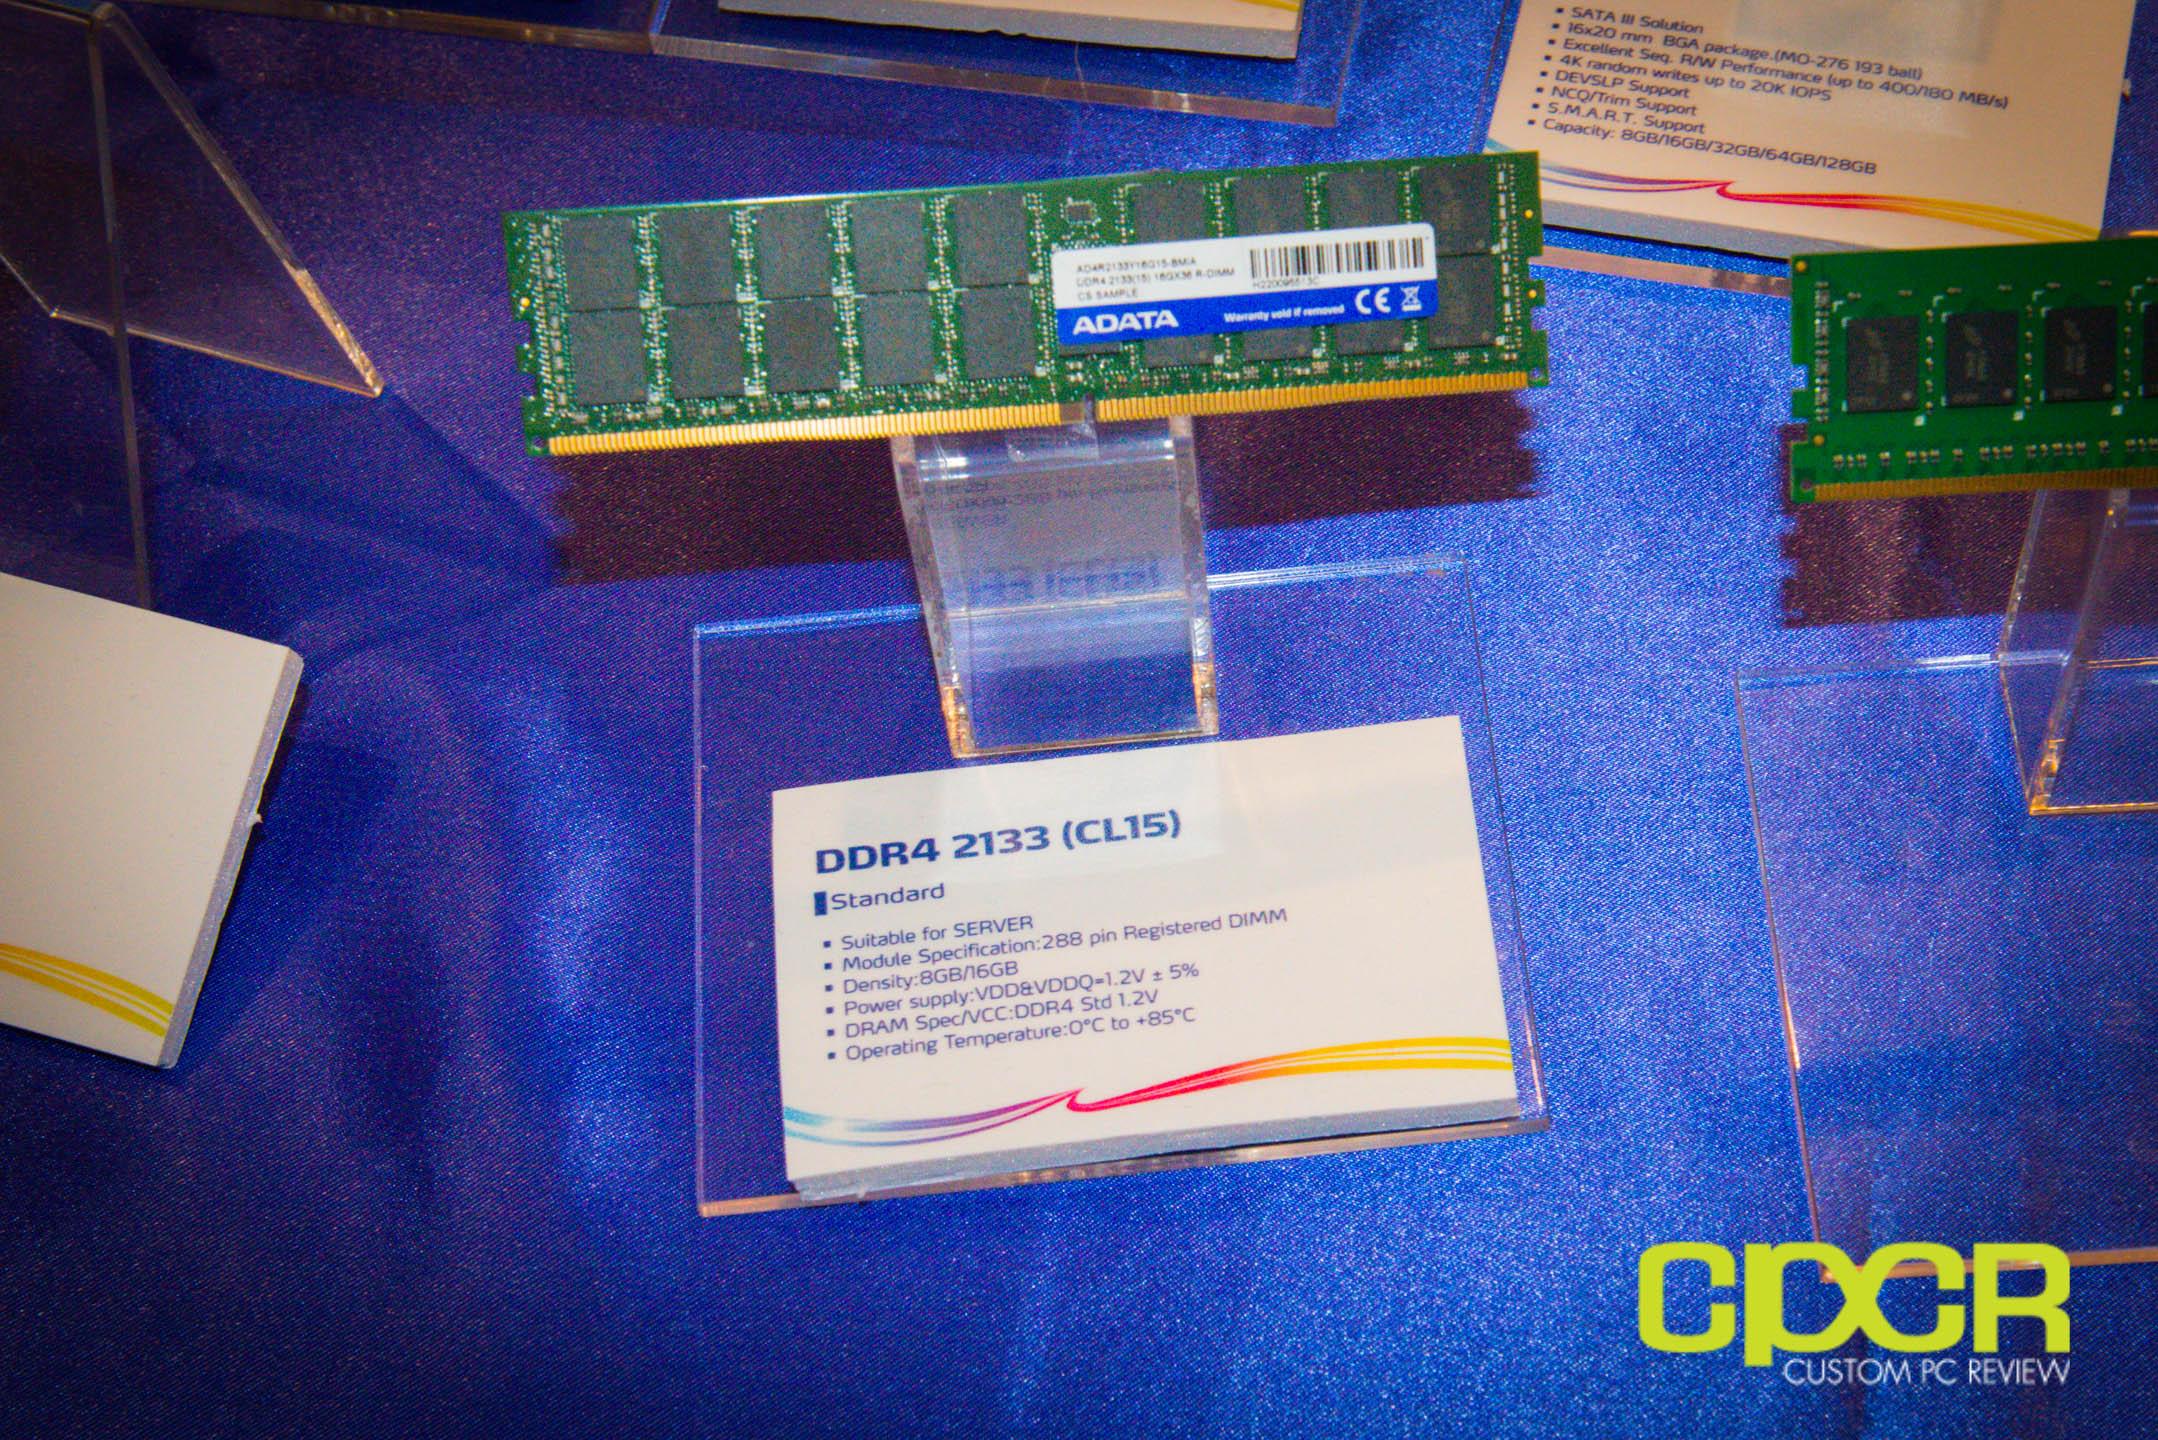 adata-ces-2014-ddr4-xpg-v2-colors-custom-pc-review-1